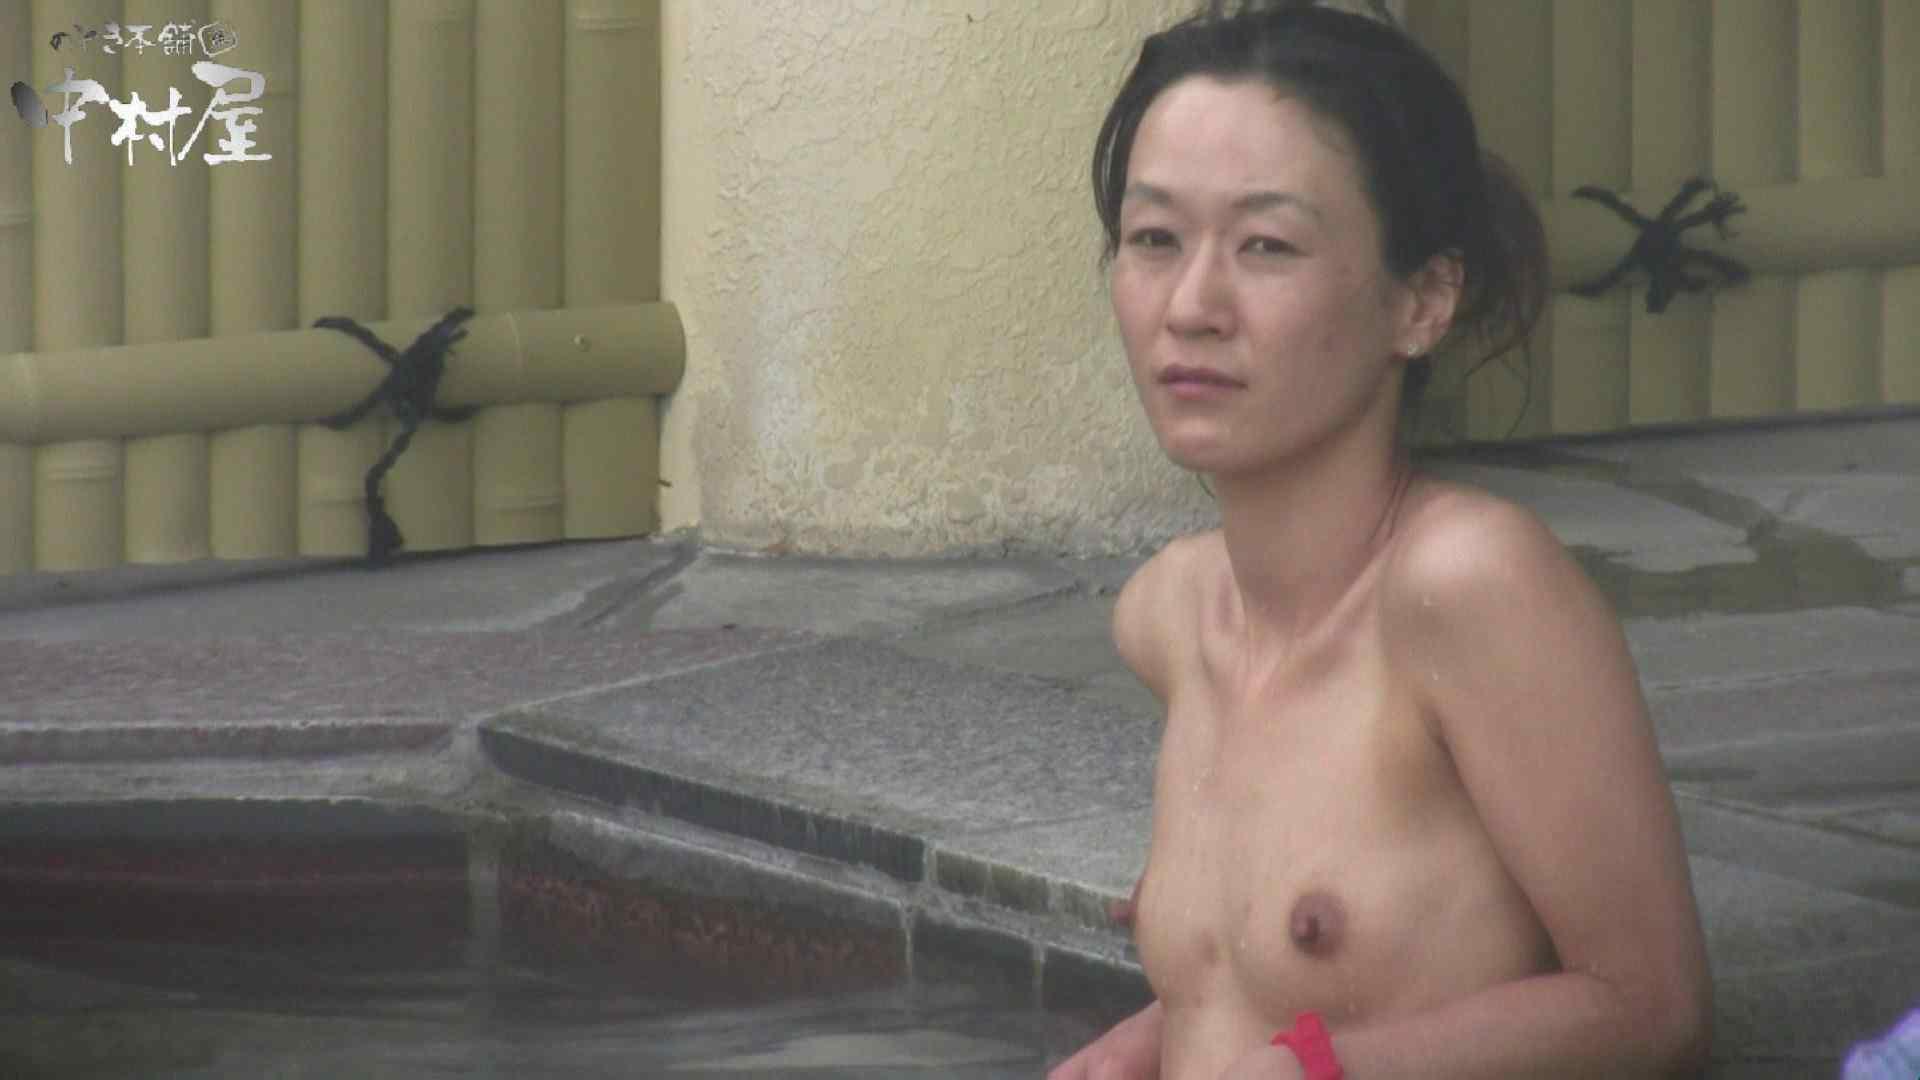 Aquaな露天風呂Vol.928 露天風呂突入 | 盗撮師作品  72pic 43